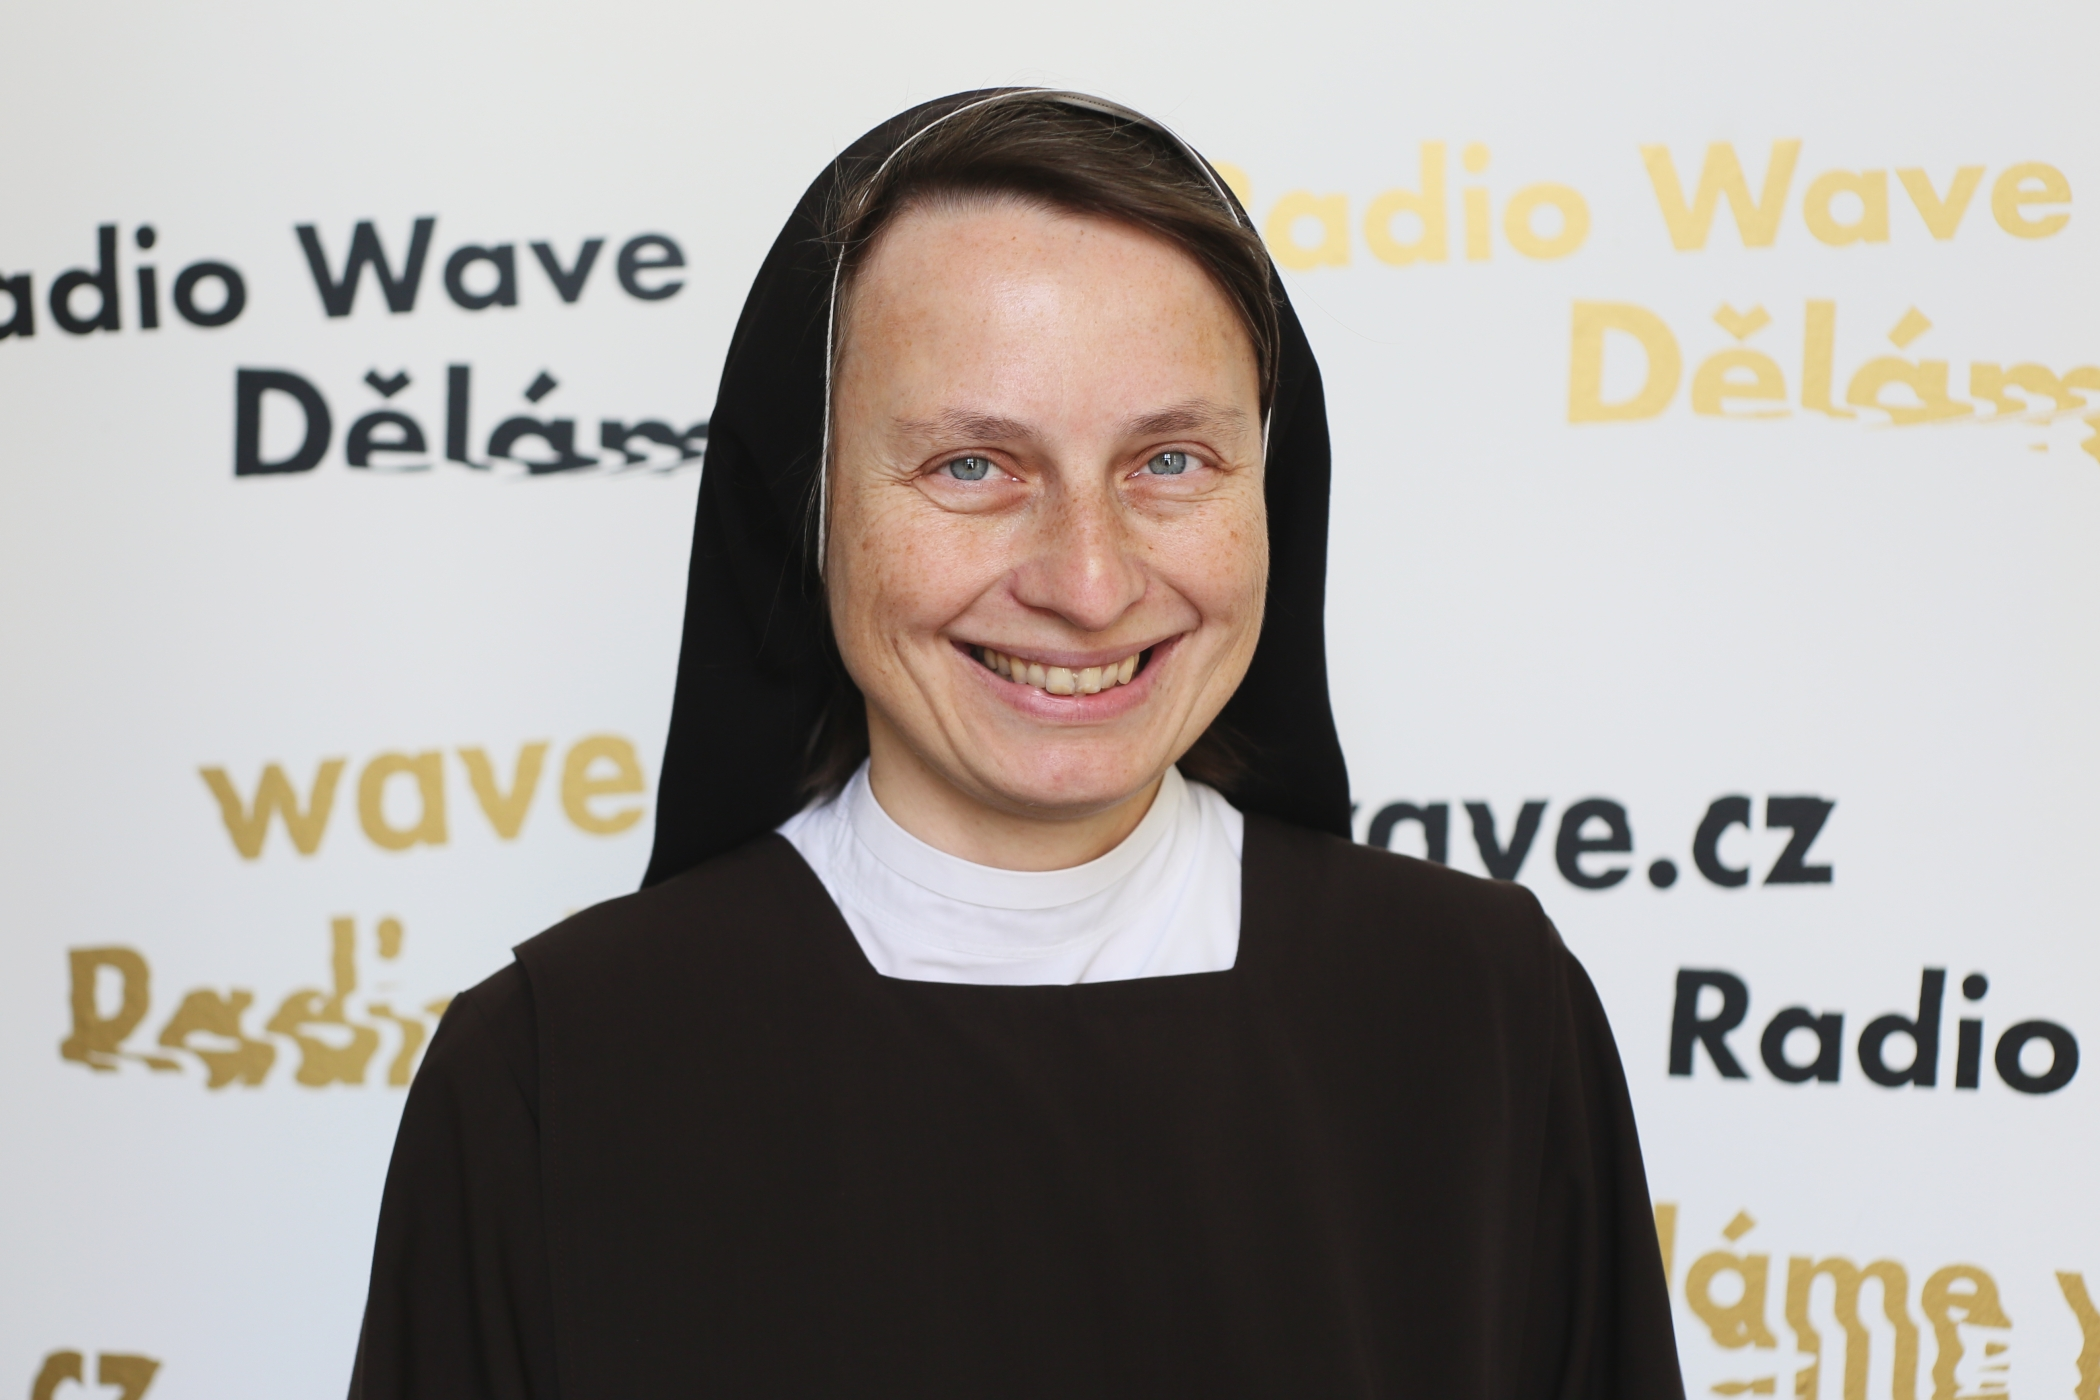 Denisa Červenková